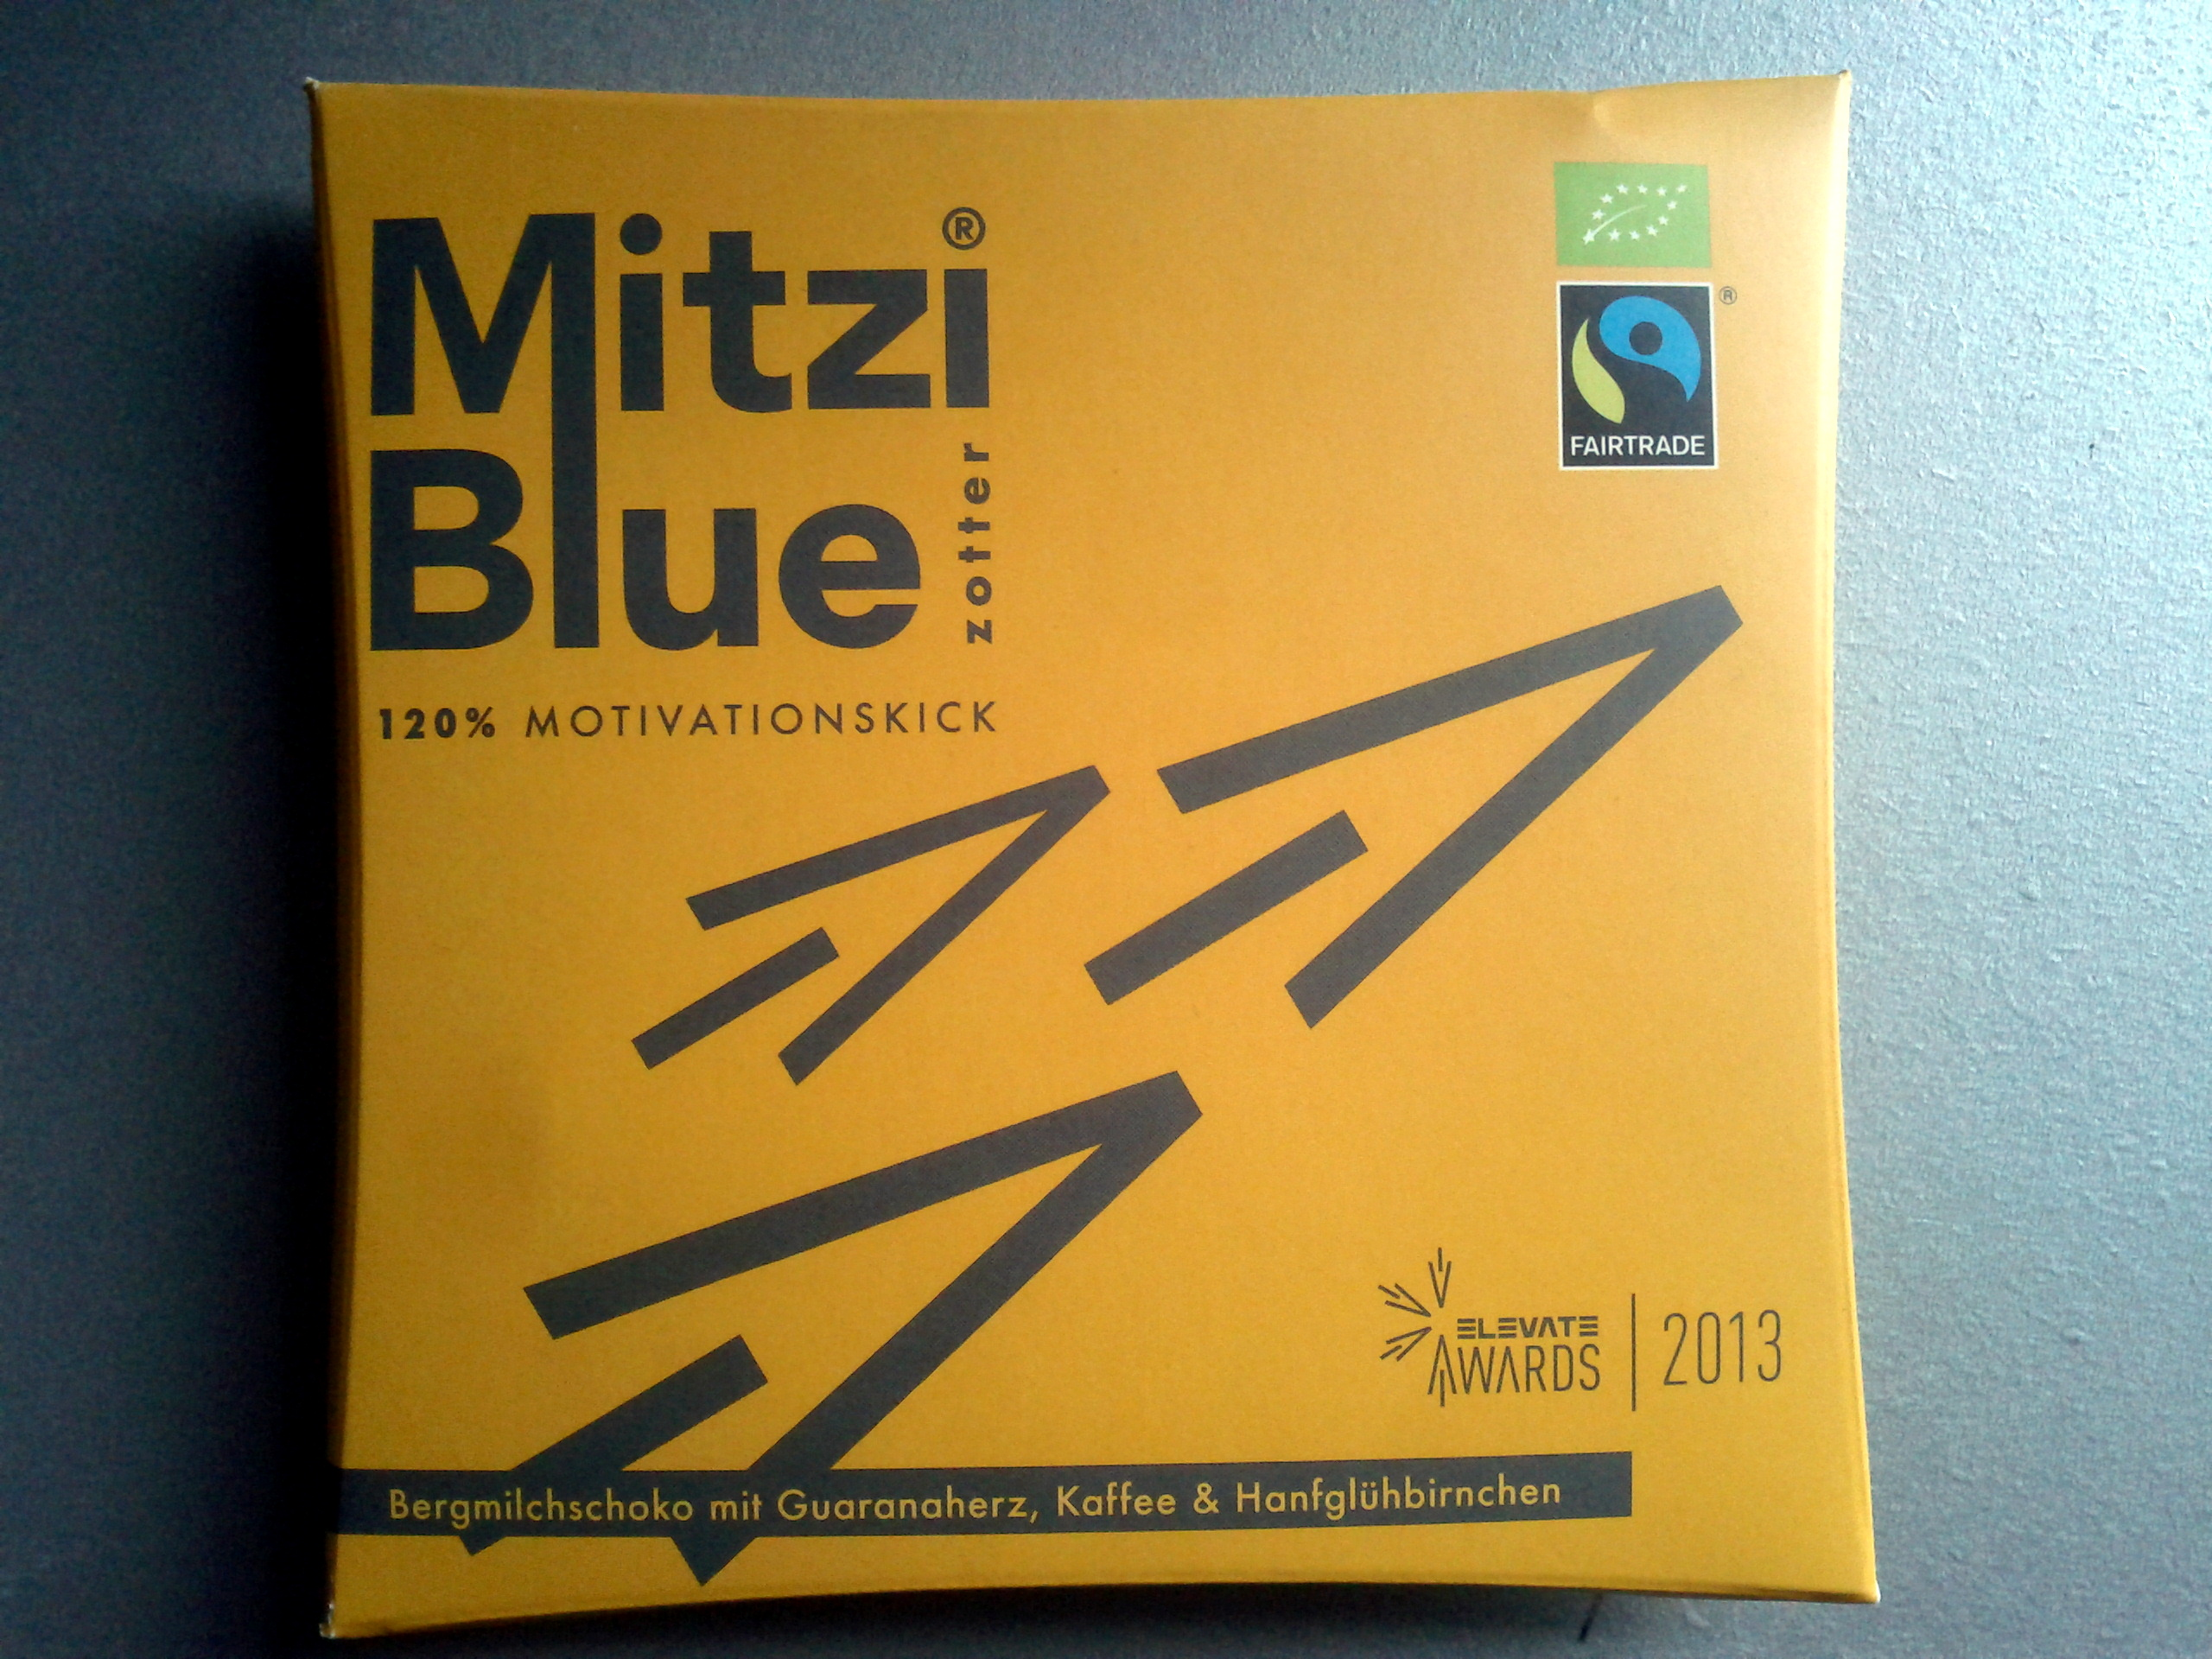 Zotter Mitzi Blue 120% Motivationskick - Product - de